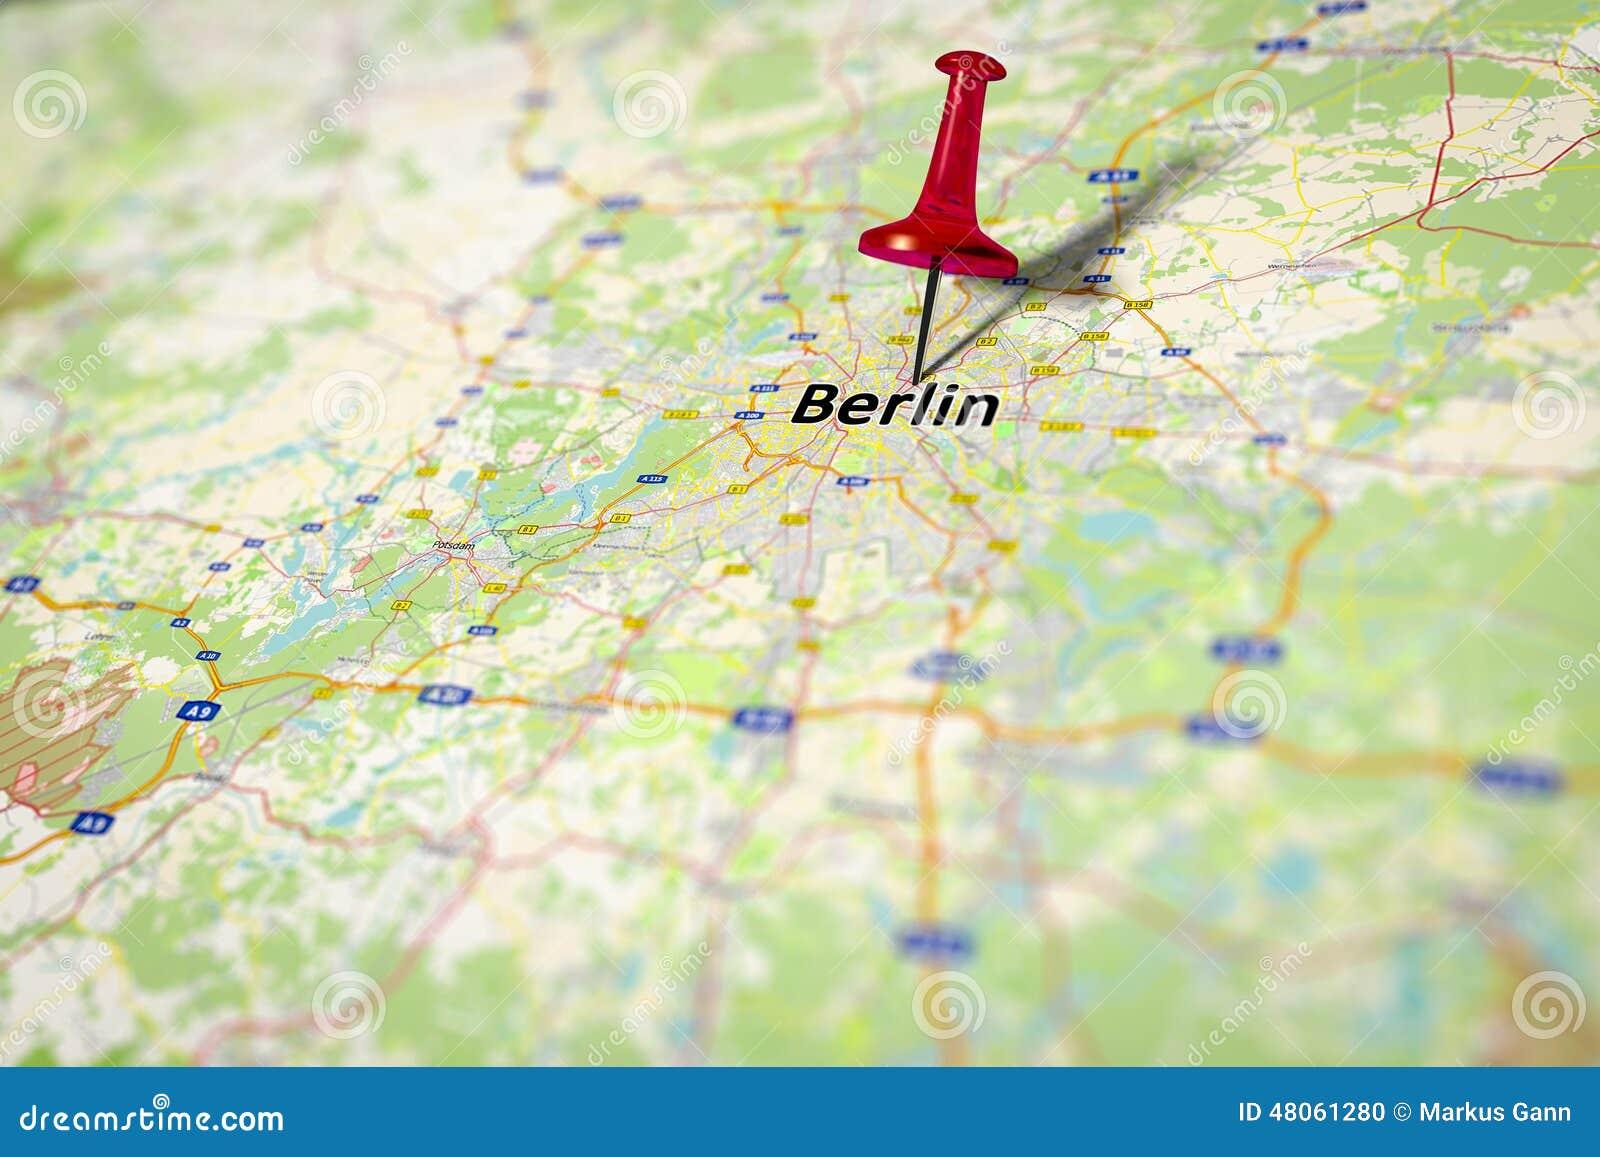 Germany Map Berlin.Map Berlin Stock Illustration Illustration Of Europe 48061280